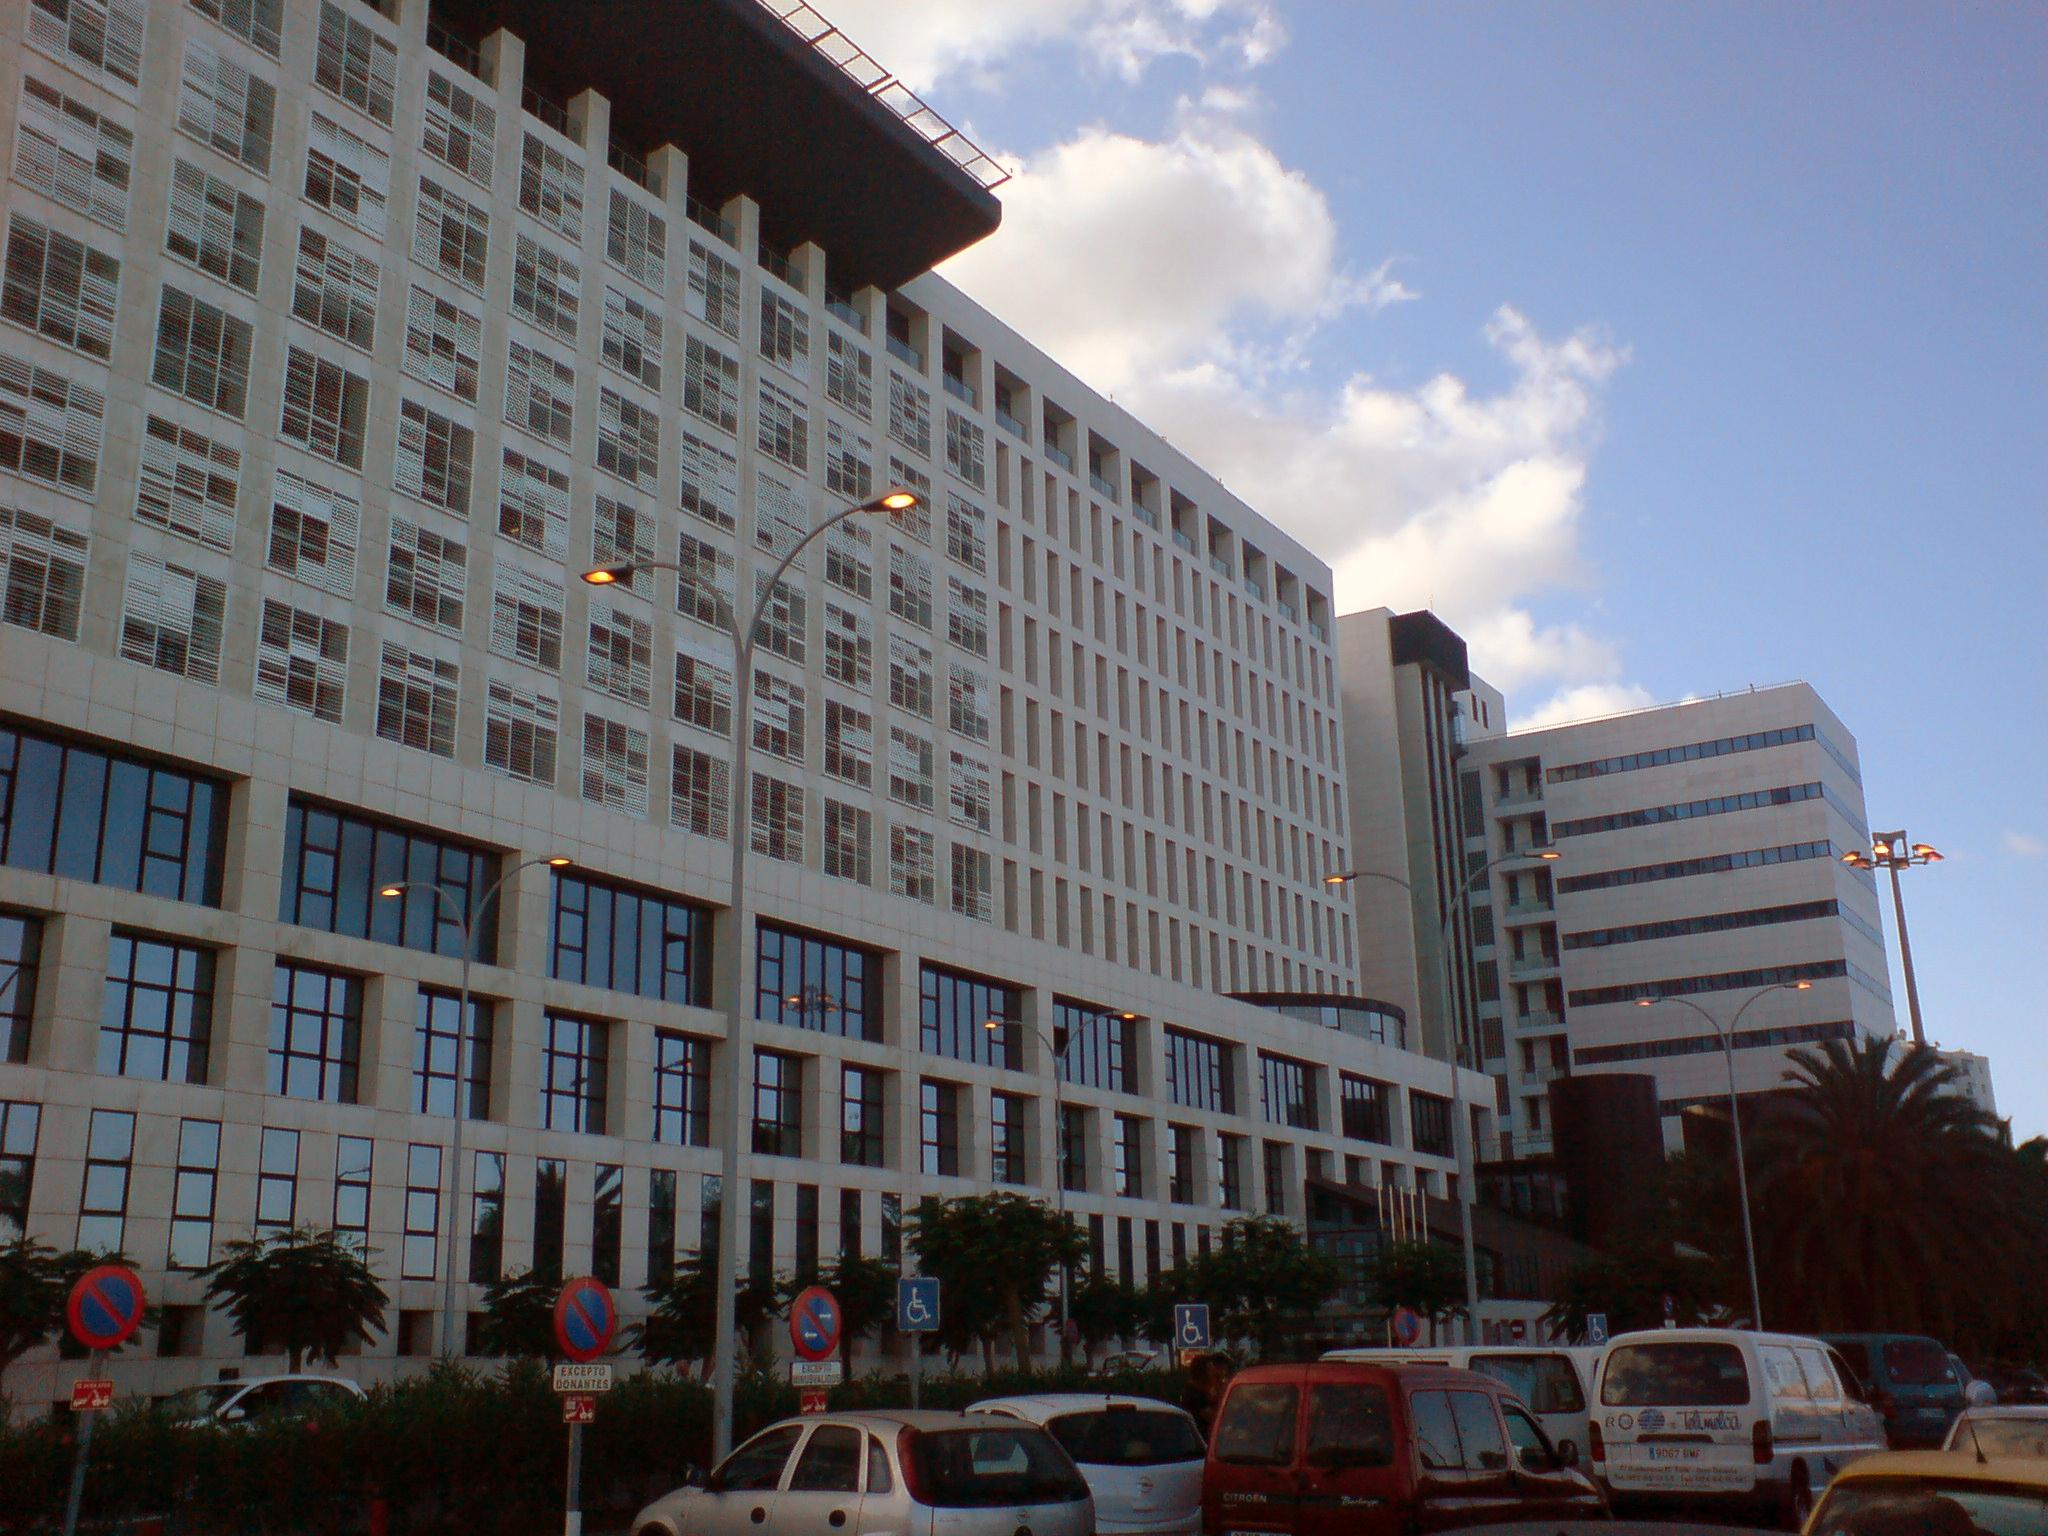 hospital materno infantil palma gran canaria: